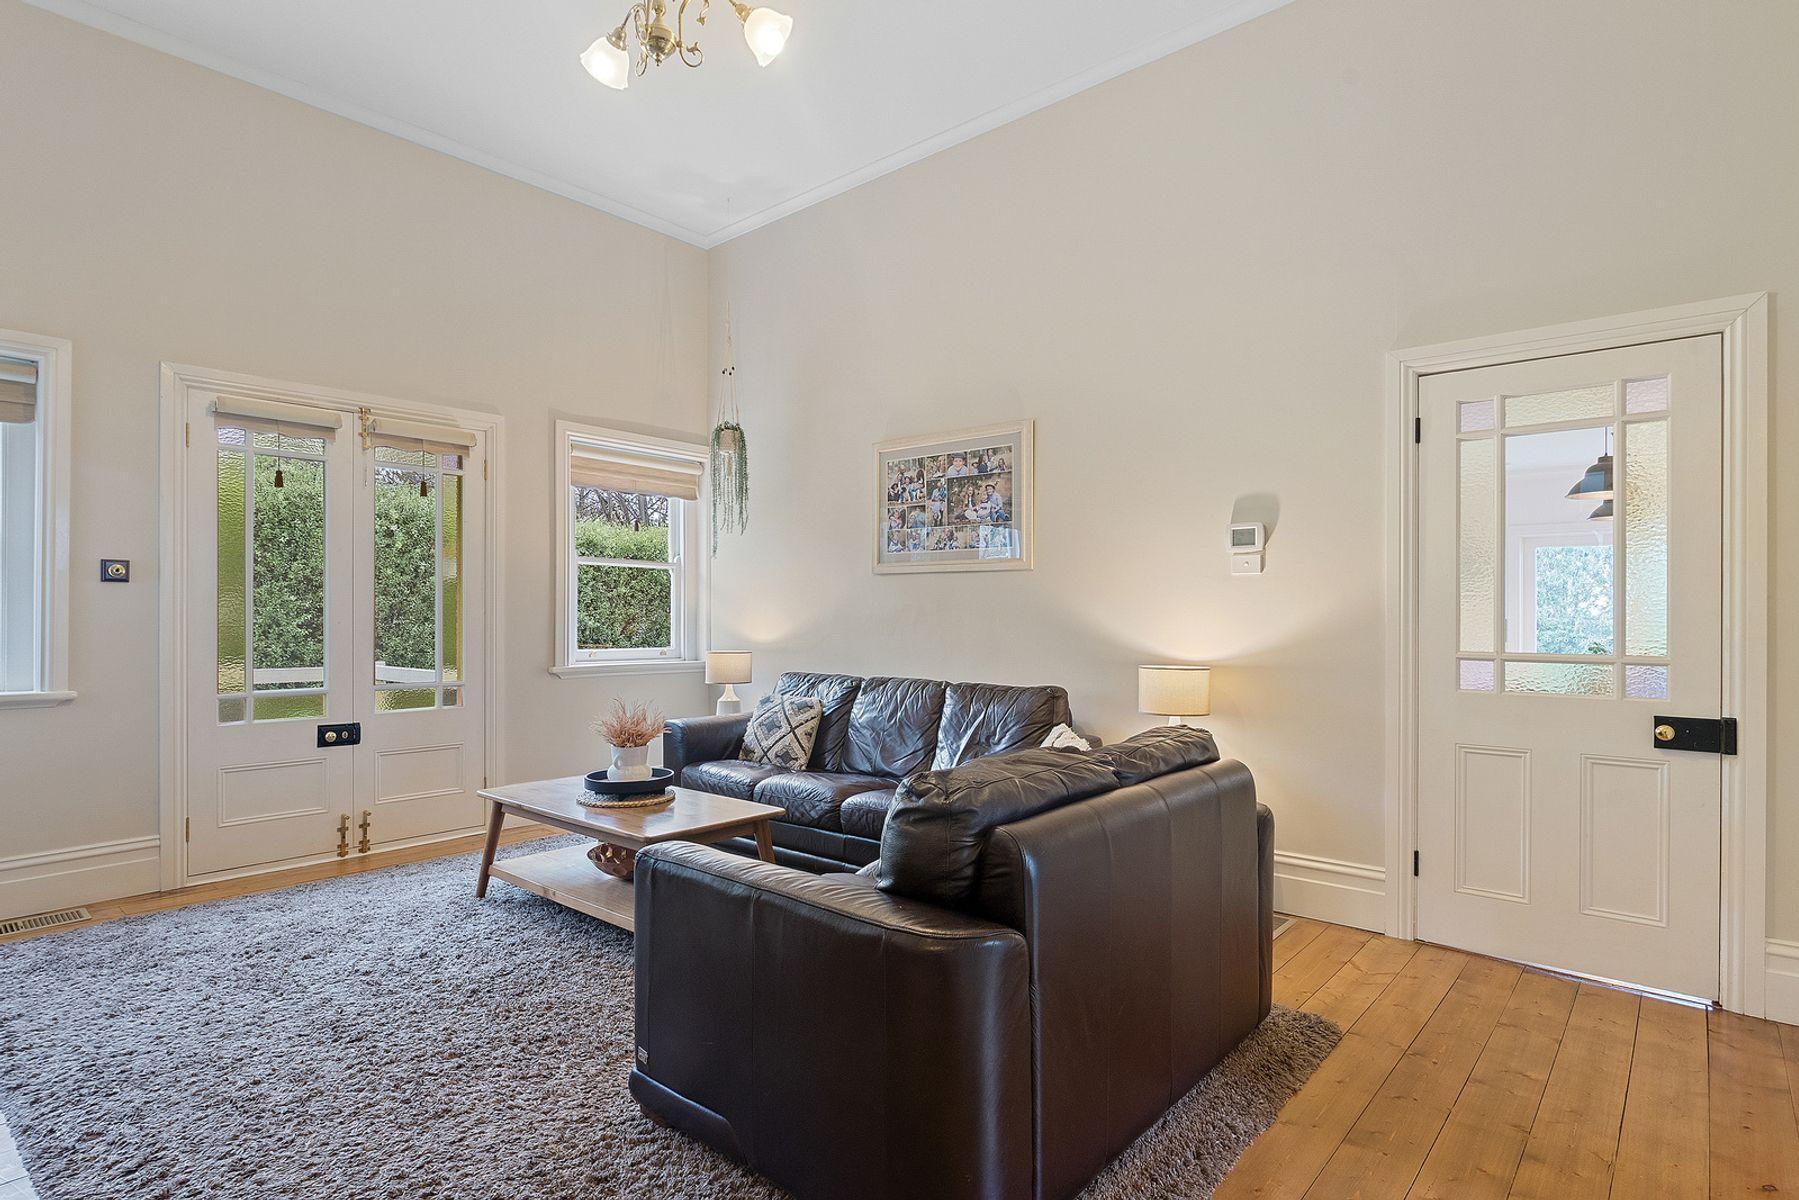 7 Malcolm Street, Quarry Hill, VIC 3550